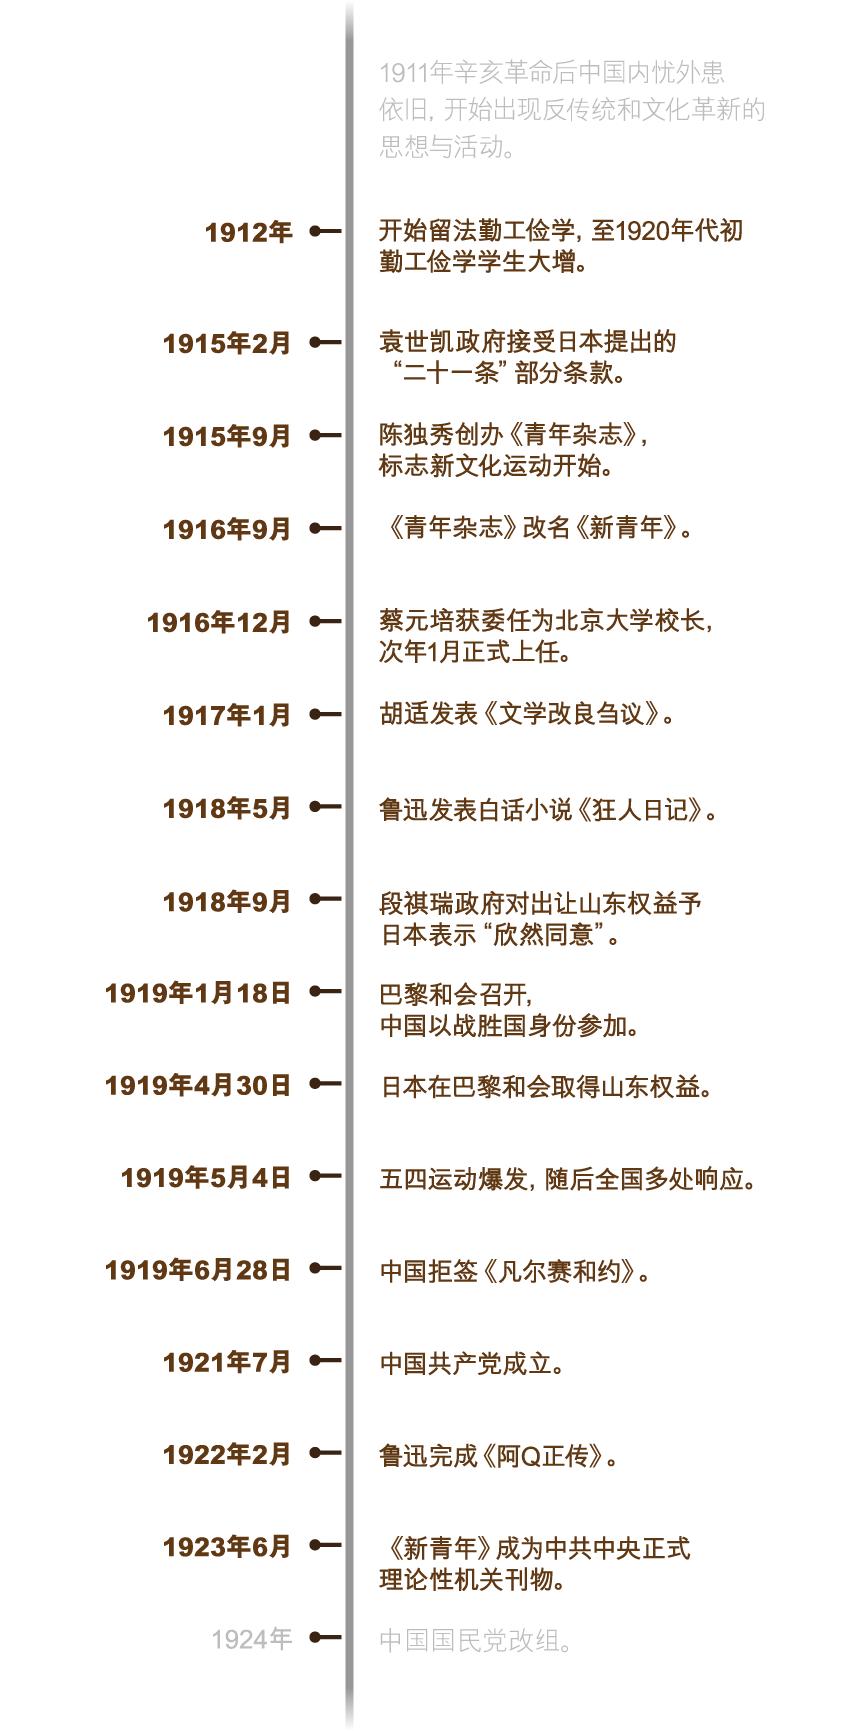 wusi_timeline_750x715_sc_v2-01